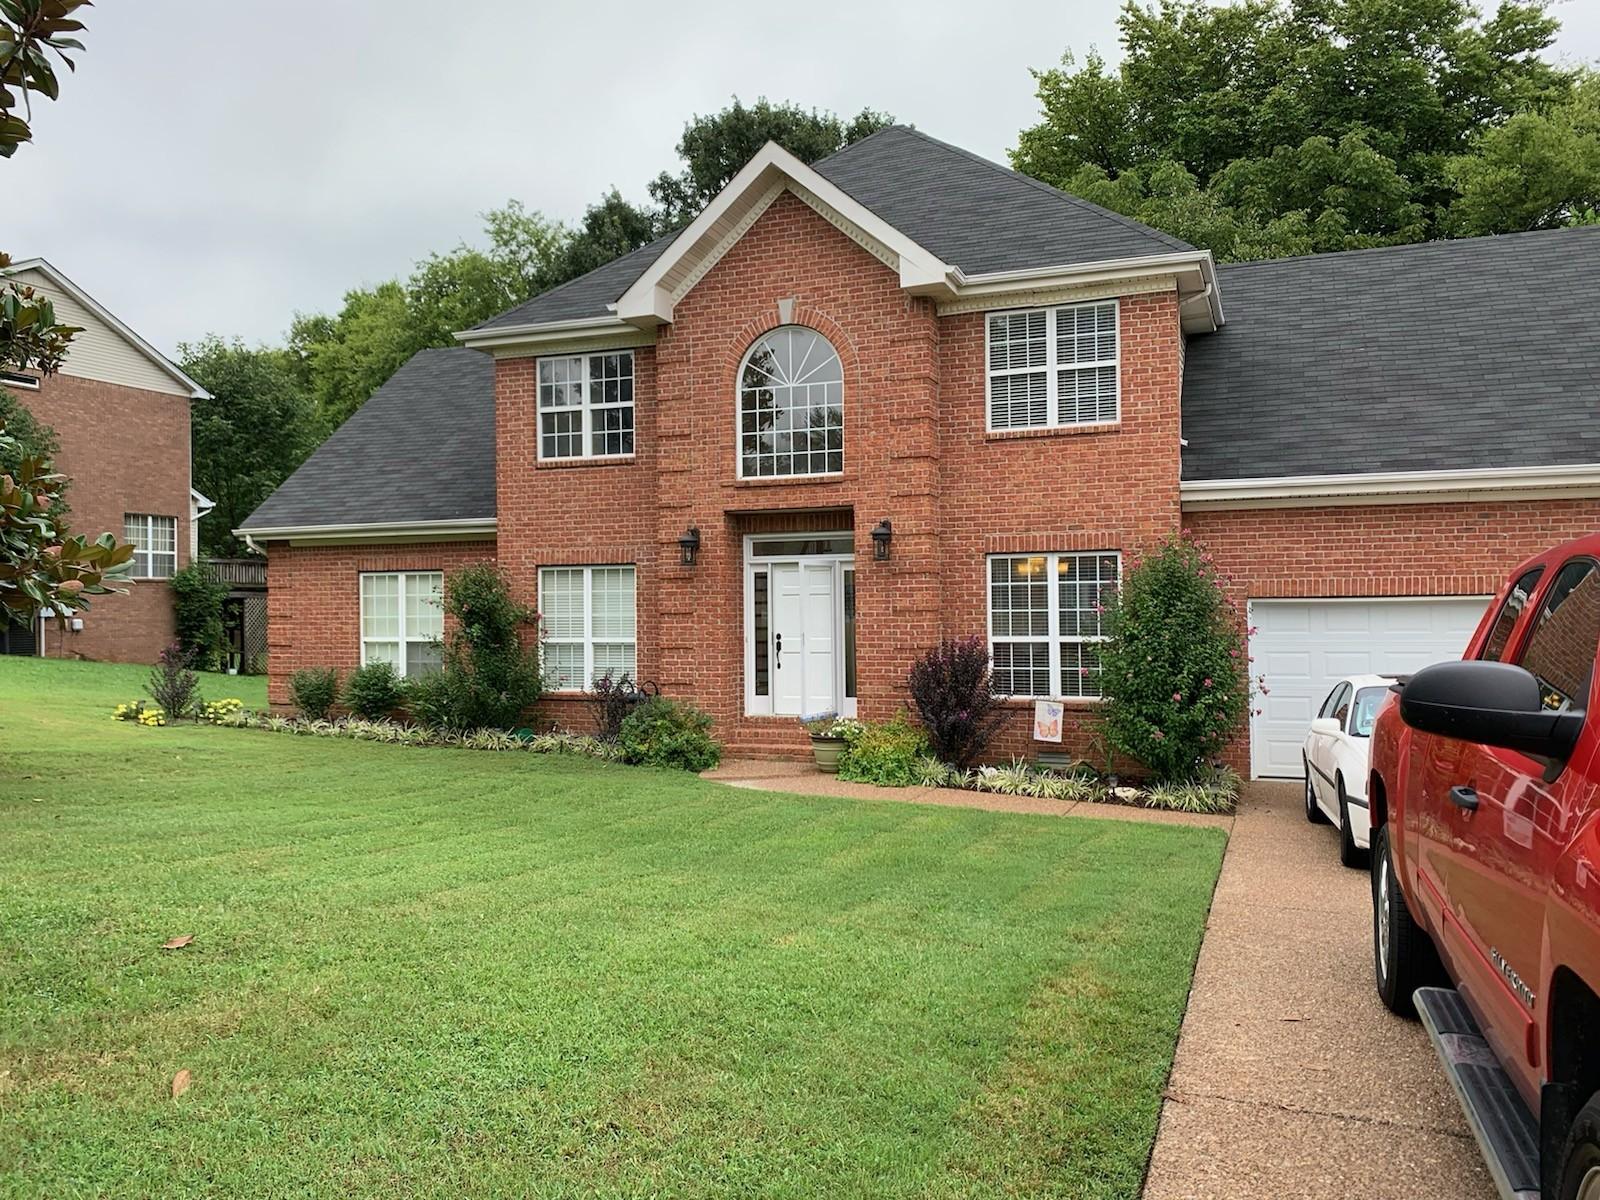 807 Loretta Dr, Goodlettsville, TN 37072 - Goodlettsville, TN real estate listing